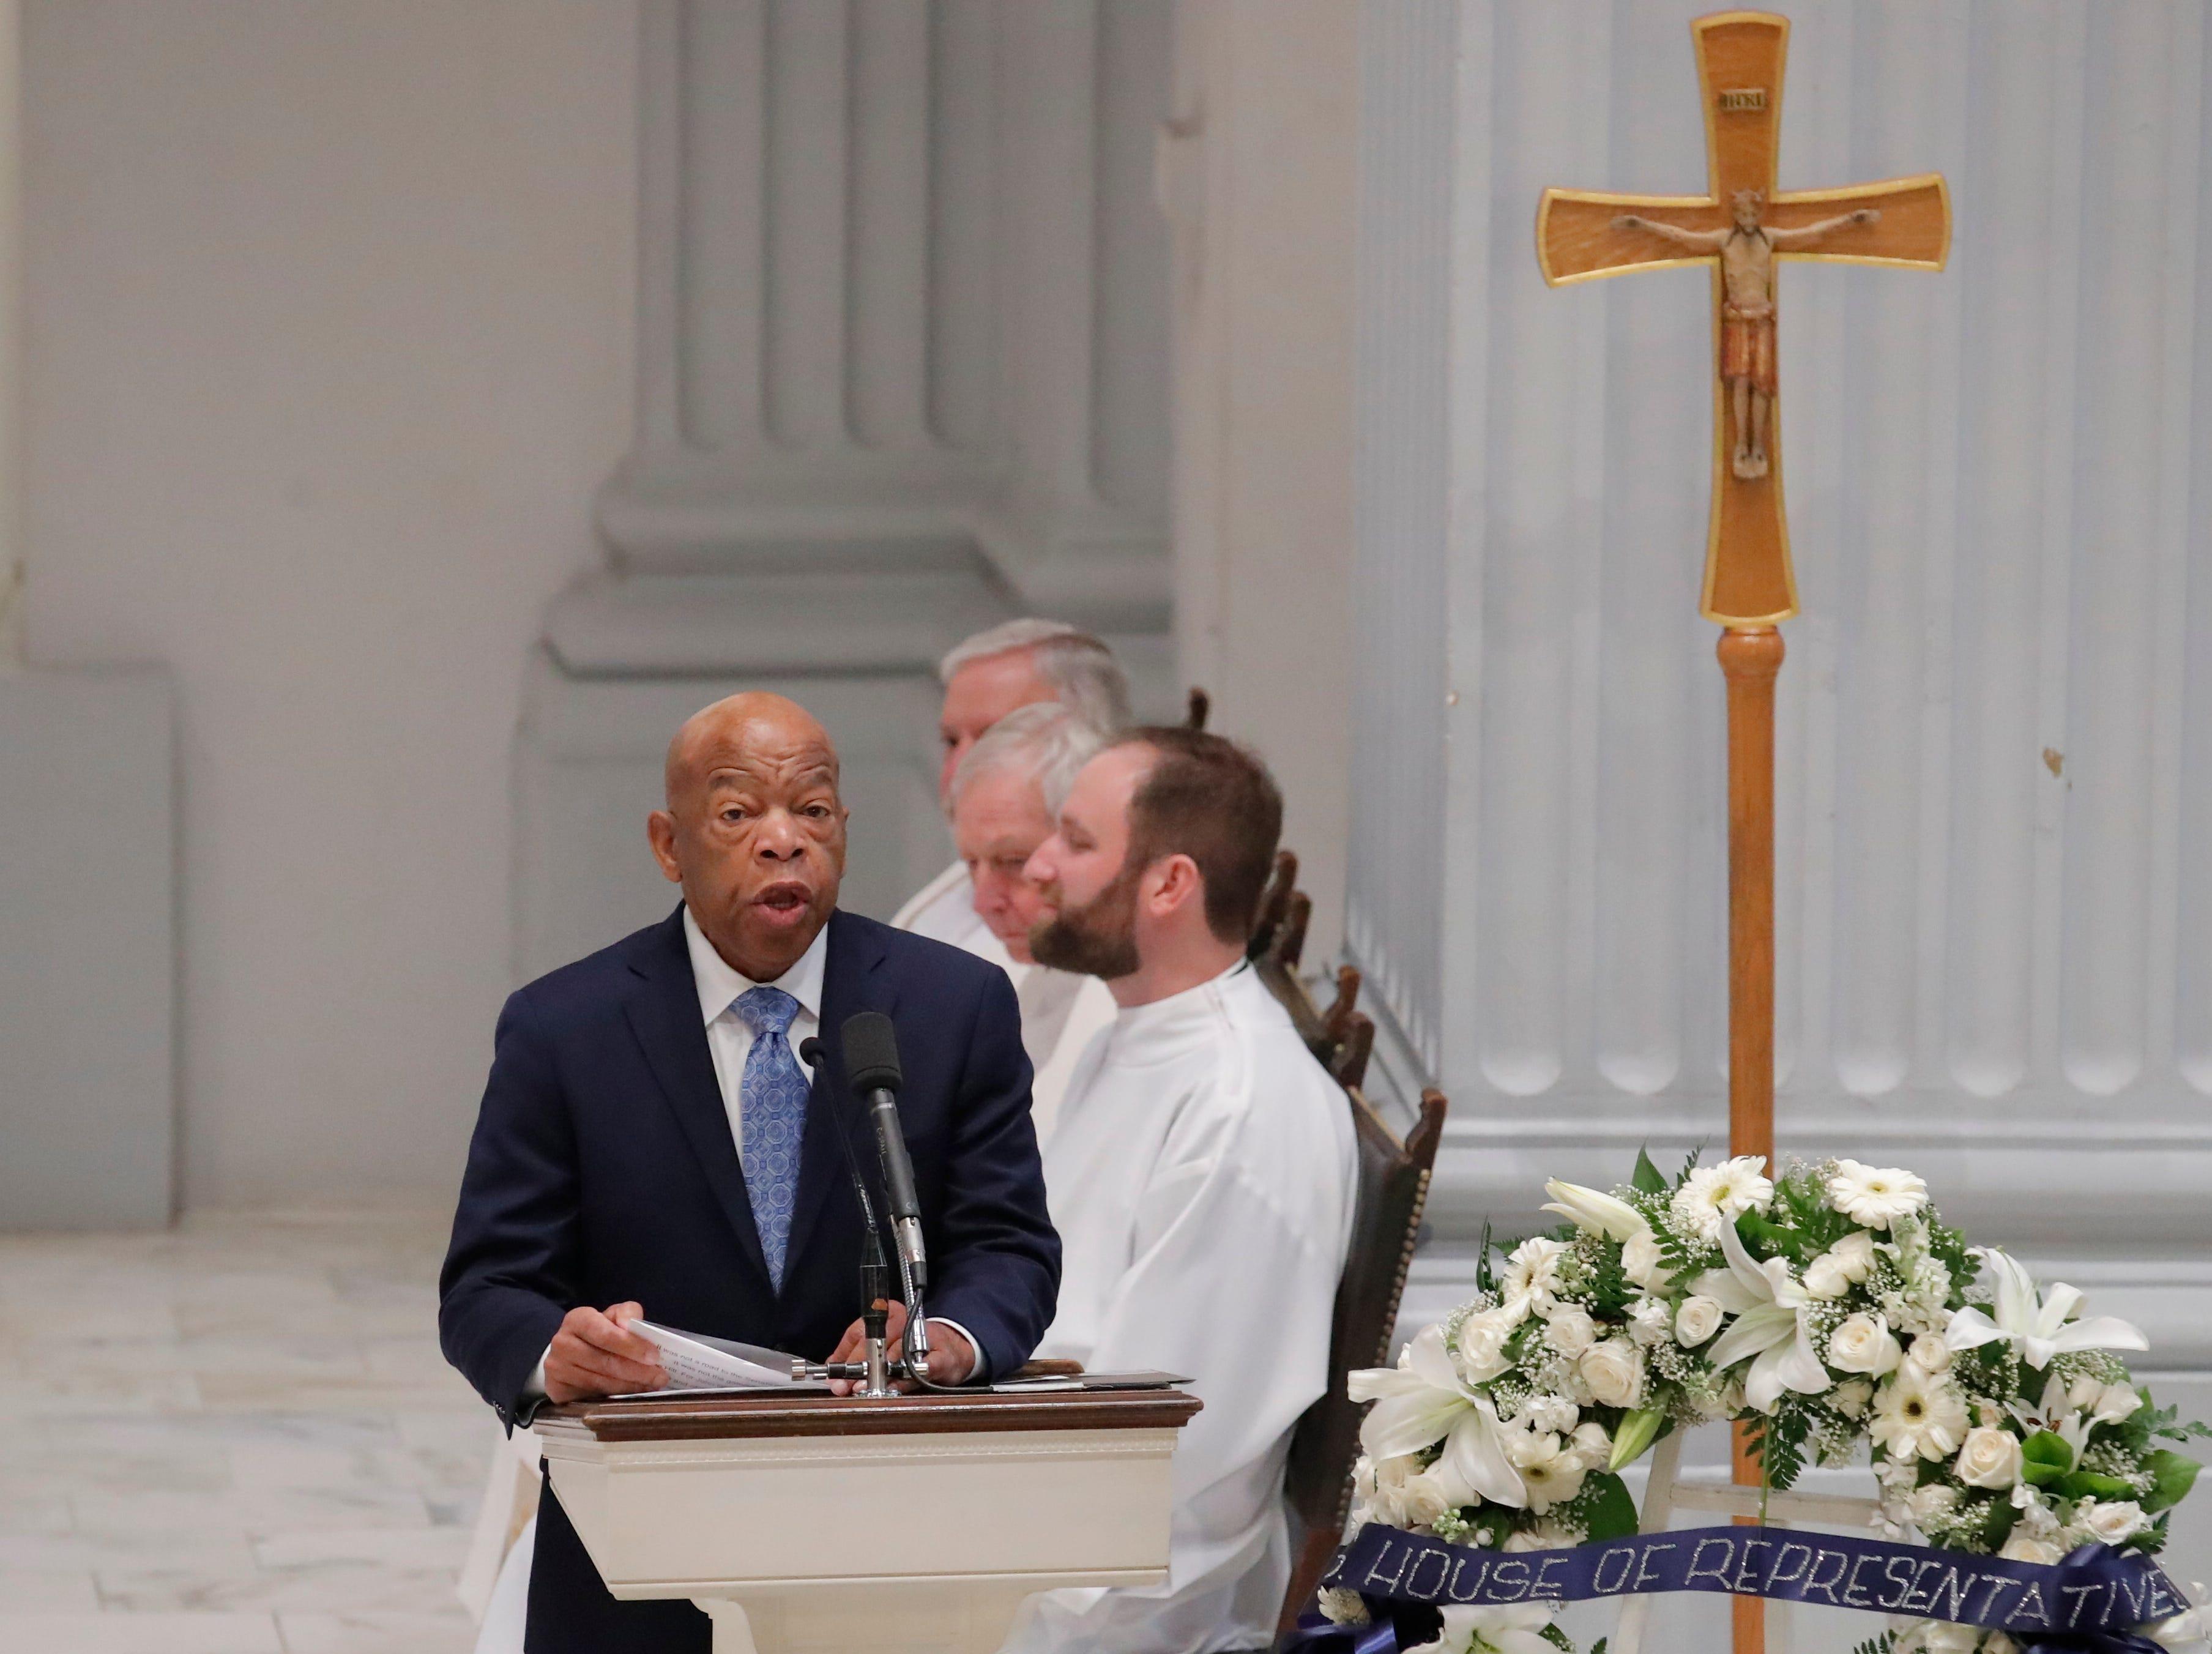 Rep. John Lewis, D-Ga., addresses John Dingell's funeral in Washington, D.C.